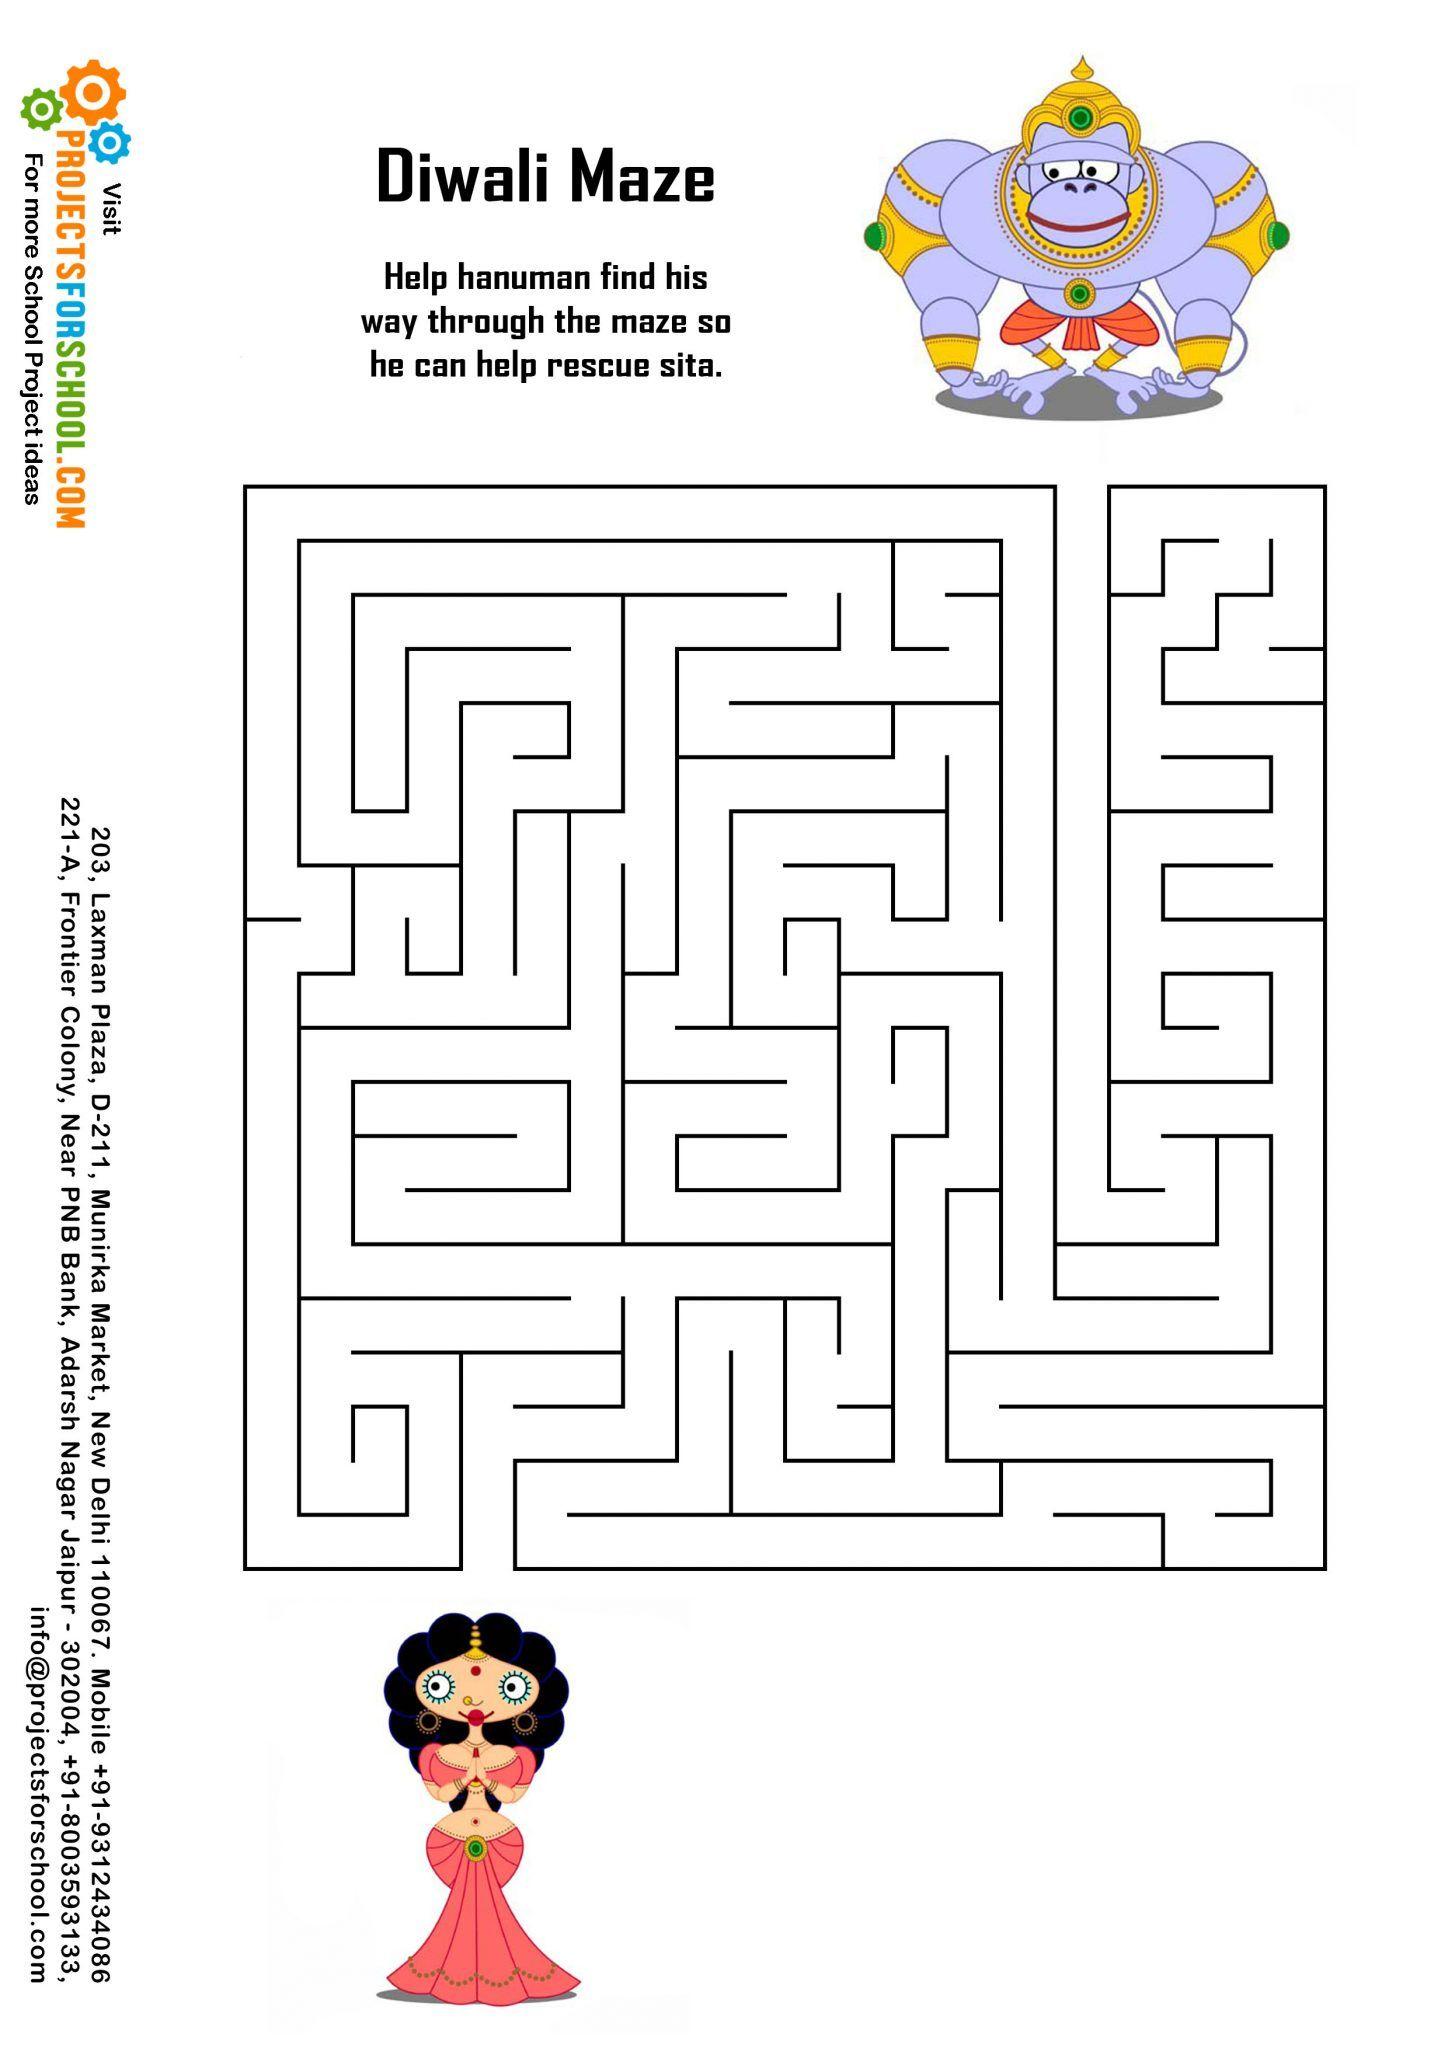 Diwali Maze